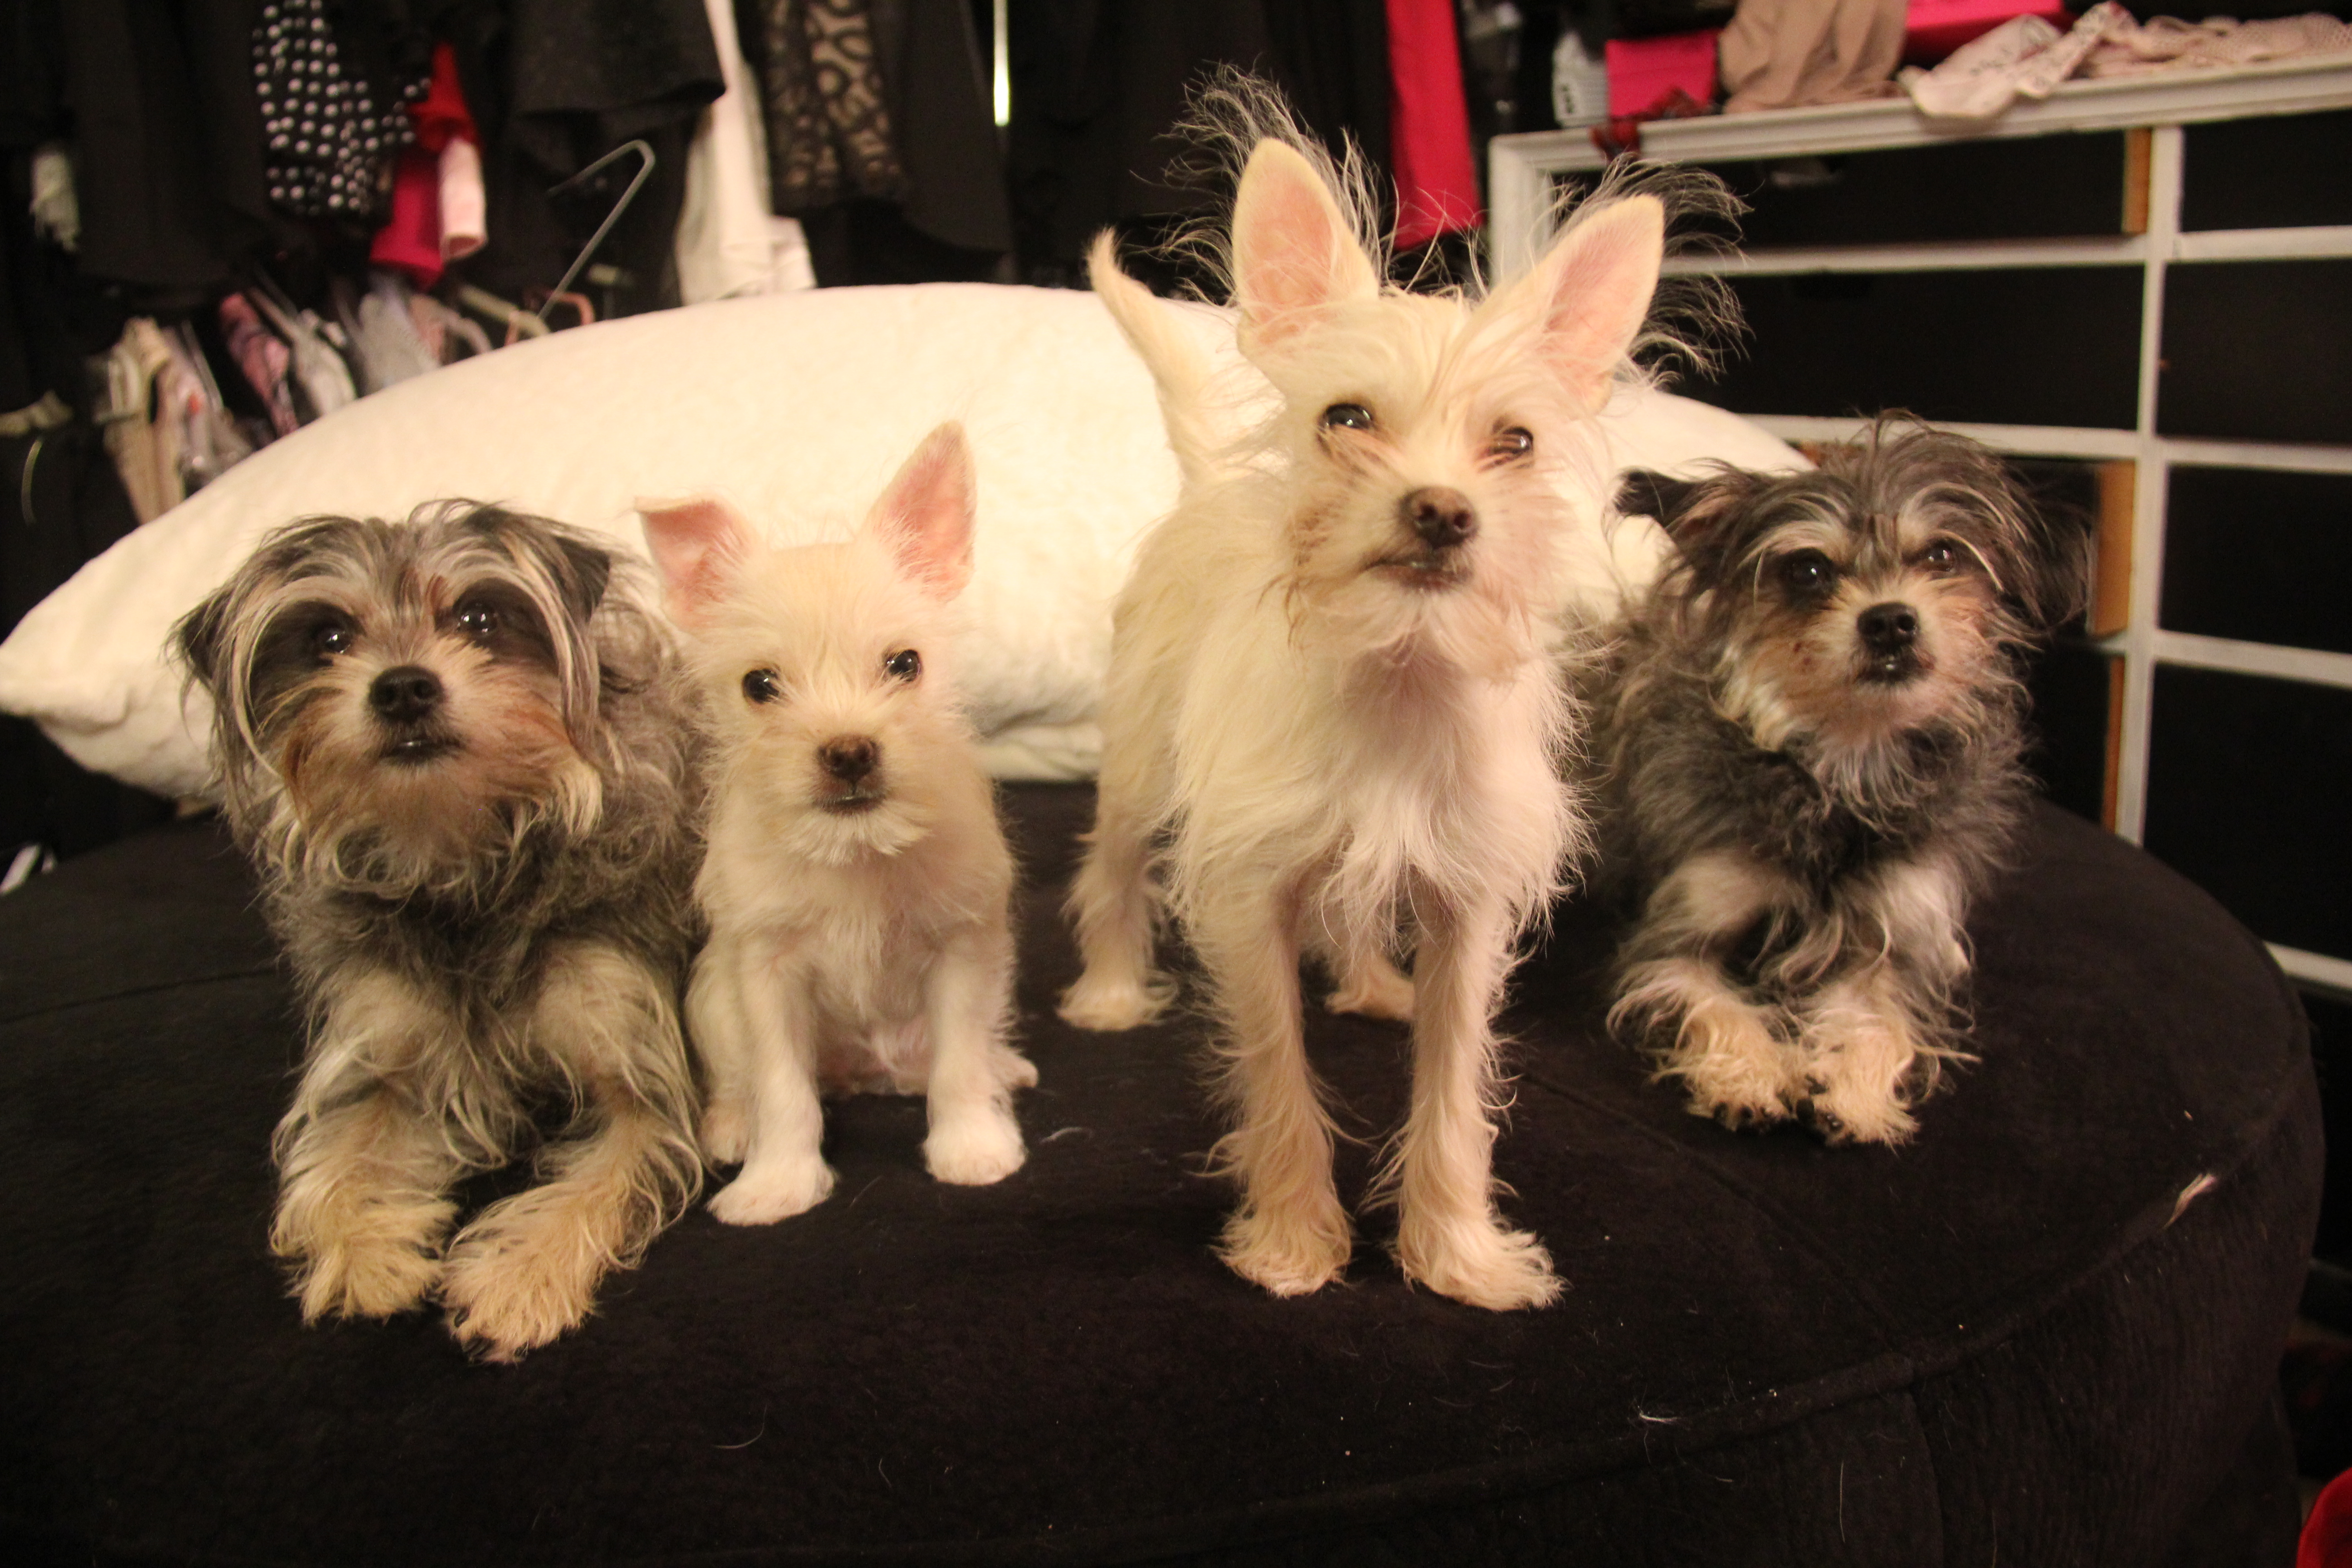 Four dog clones together